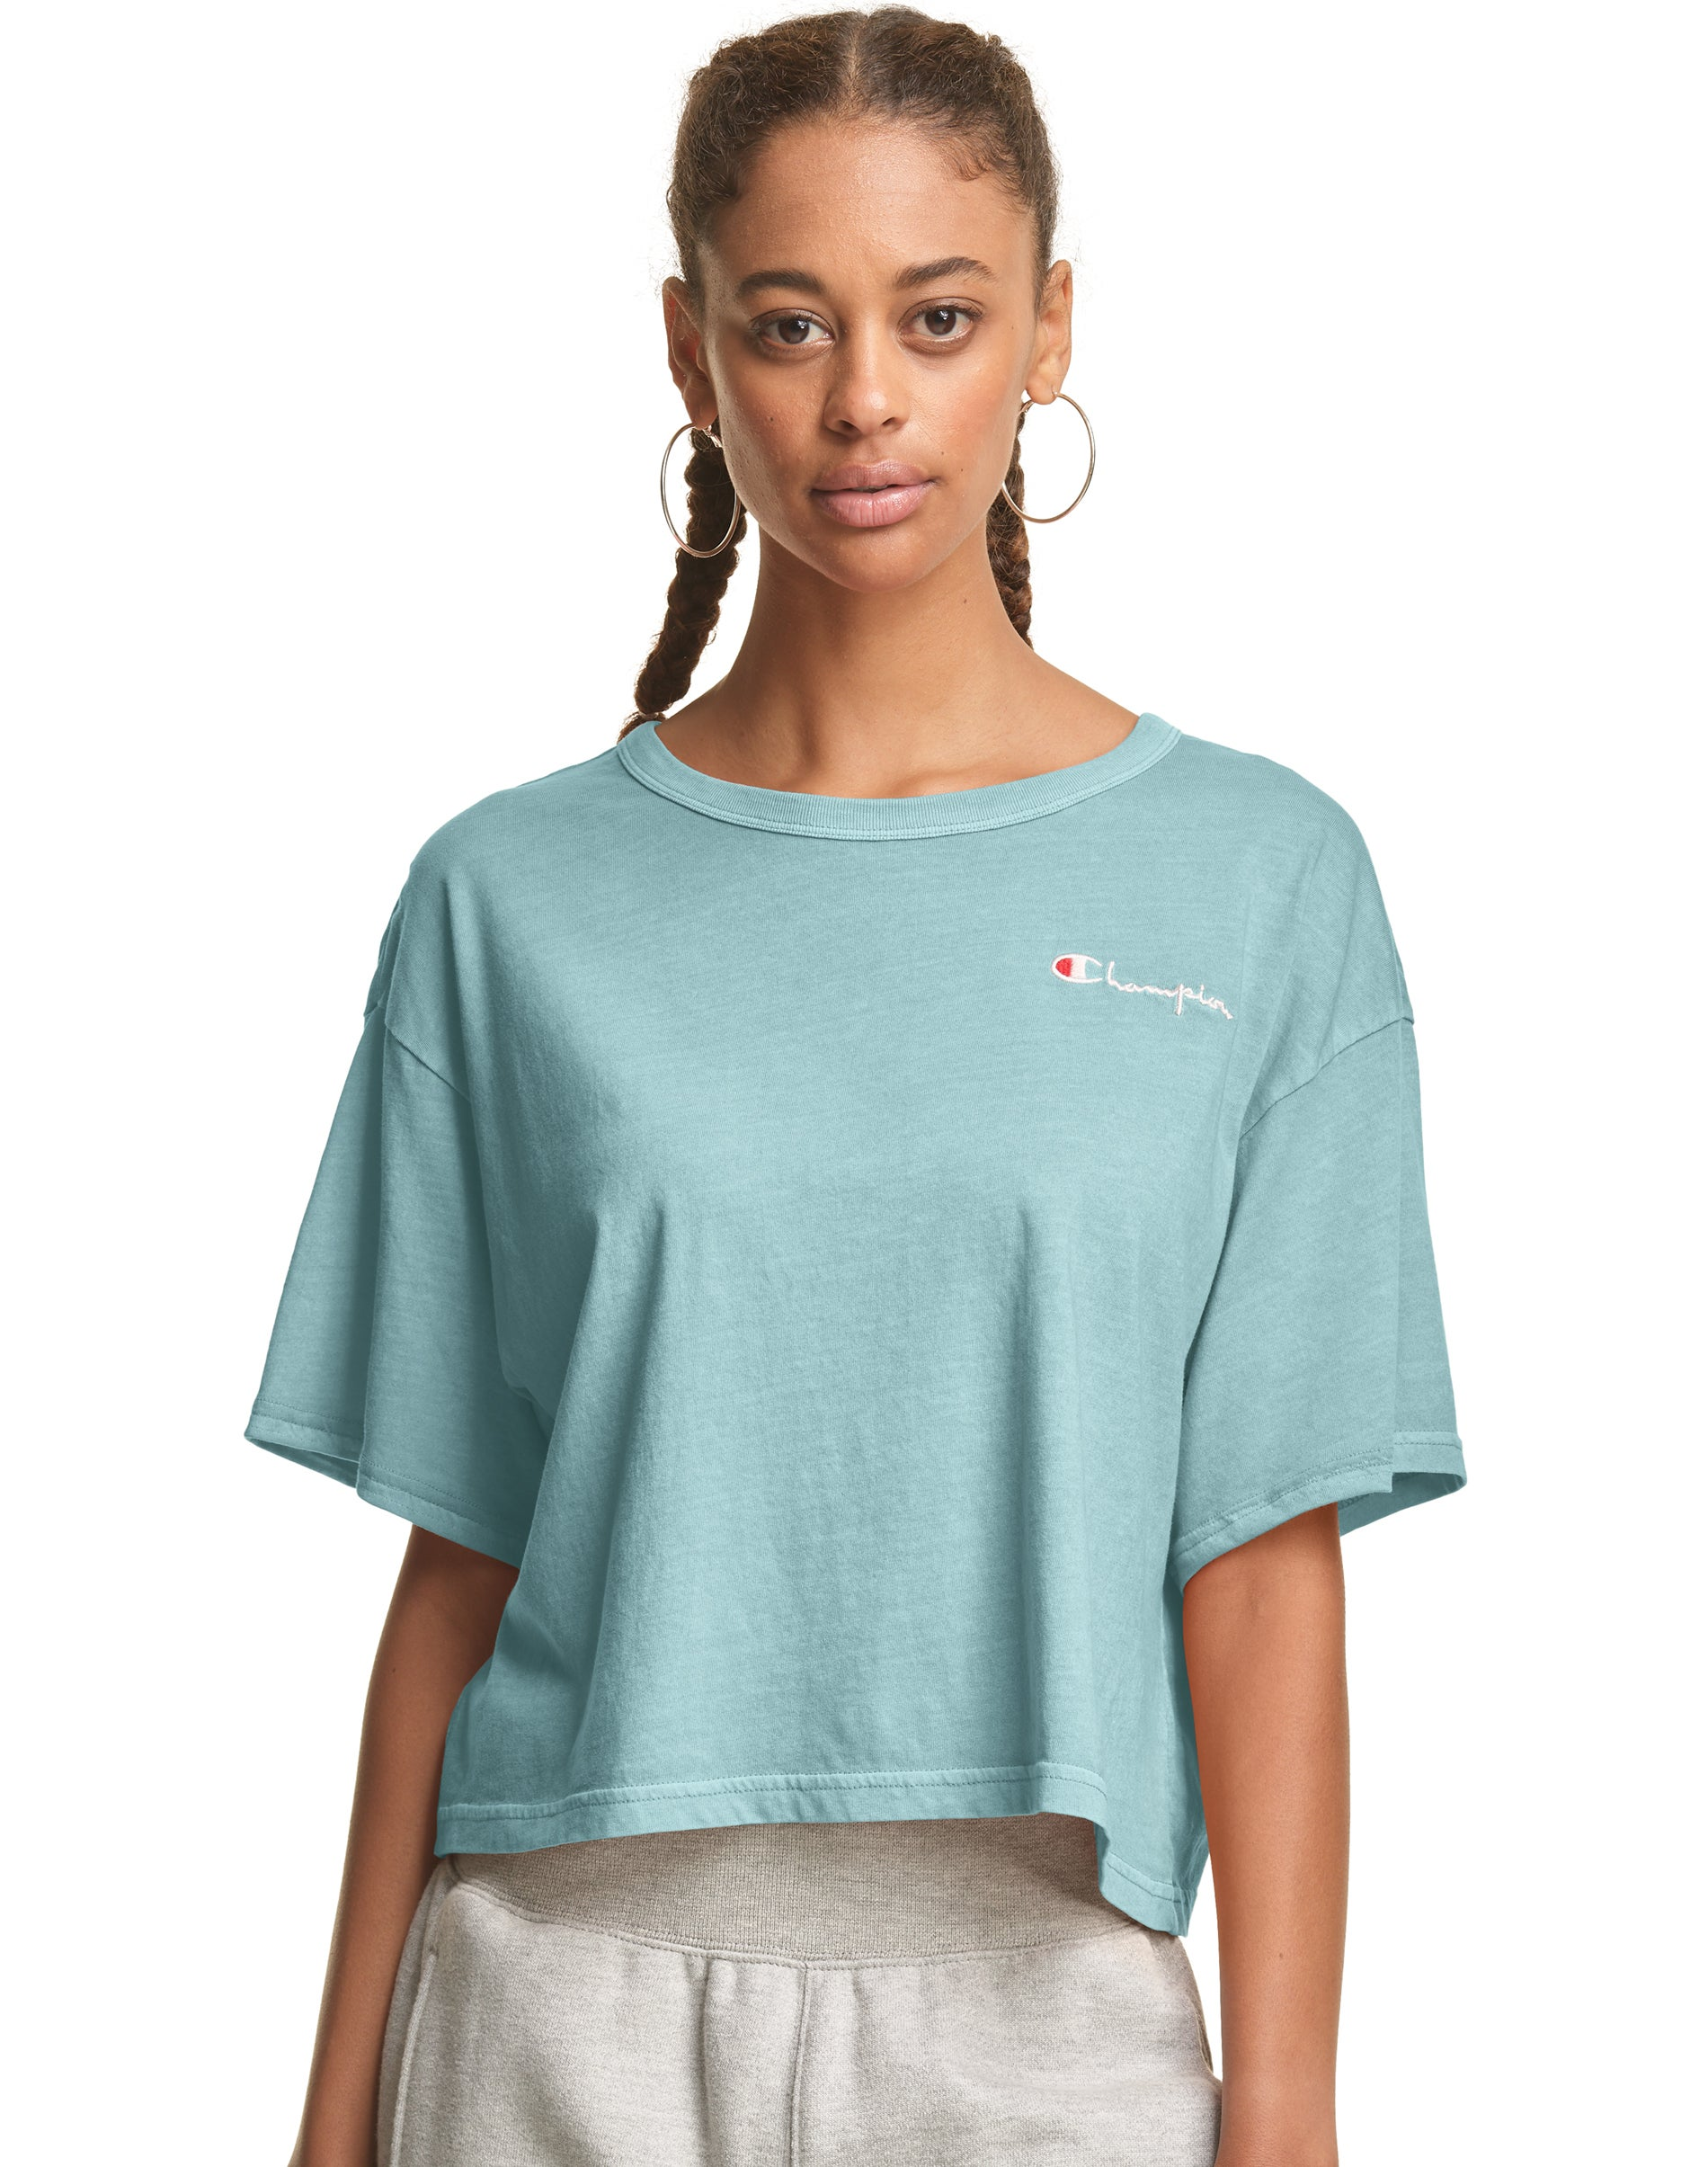 adidas Womens Fave T Shirt Cropped Tee Top Short Sleeve Crew Neck Lightweight